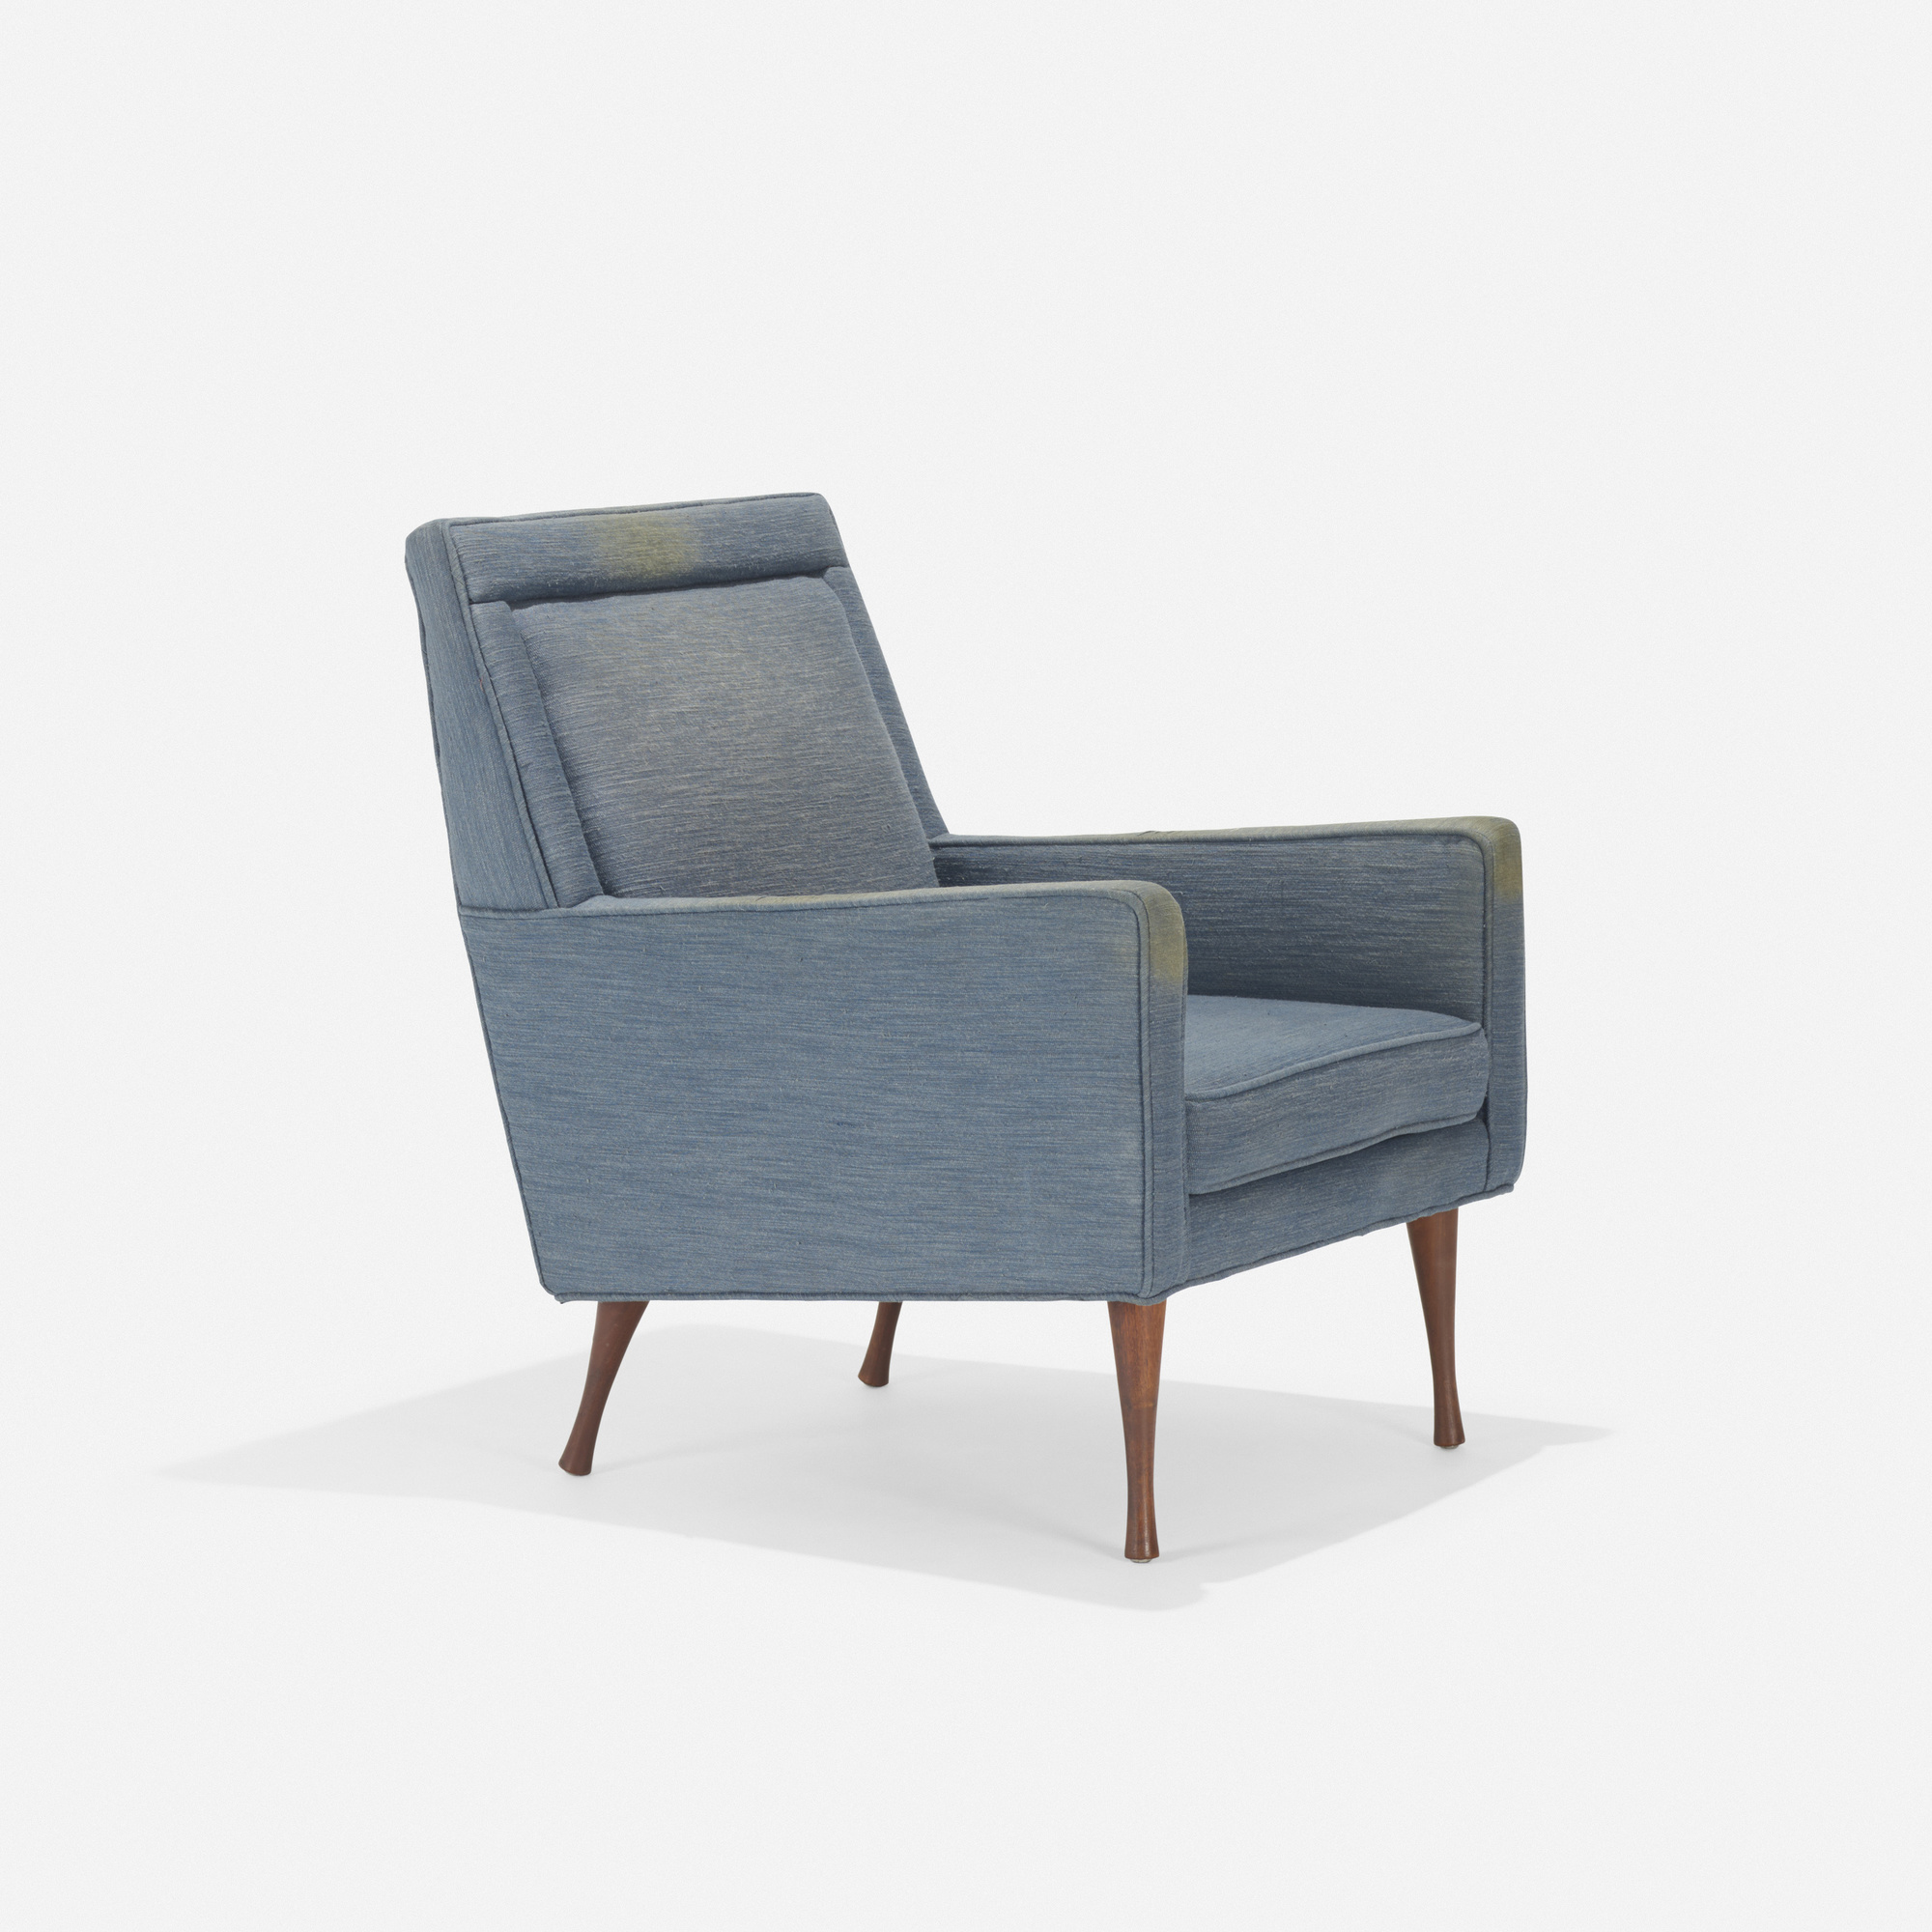 Captivating 245: Paul McCobb / Symmetric Group Lounge Chair (1 Of 2)